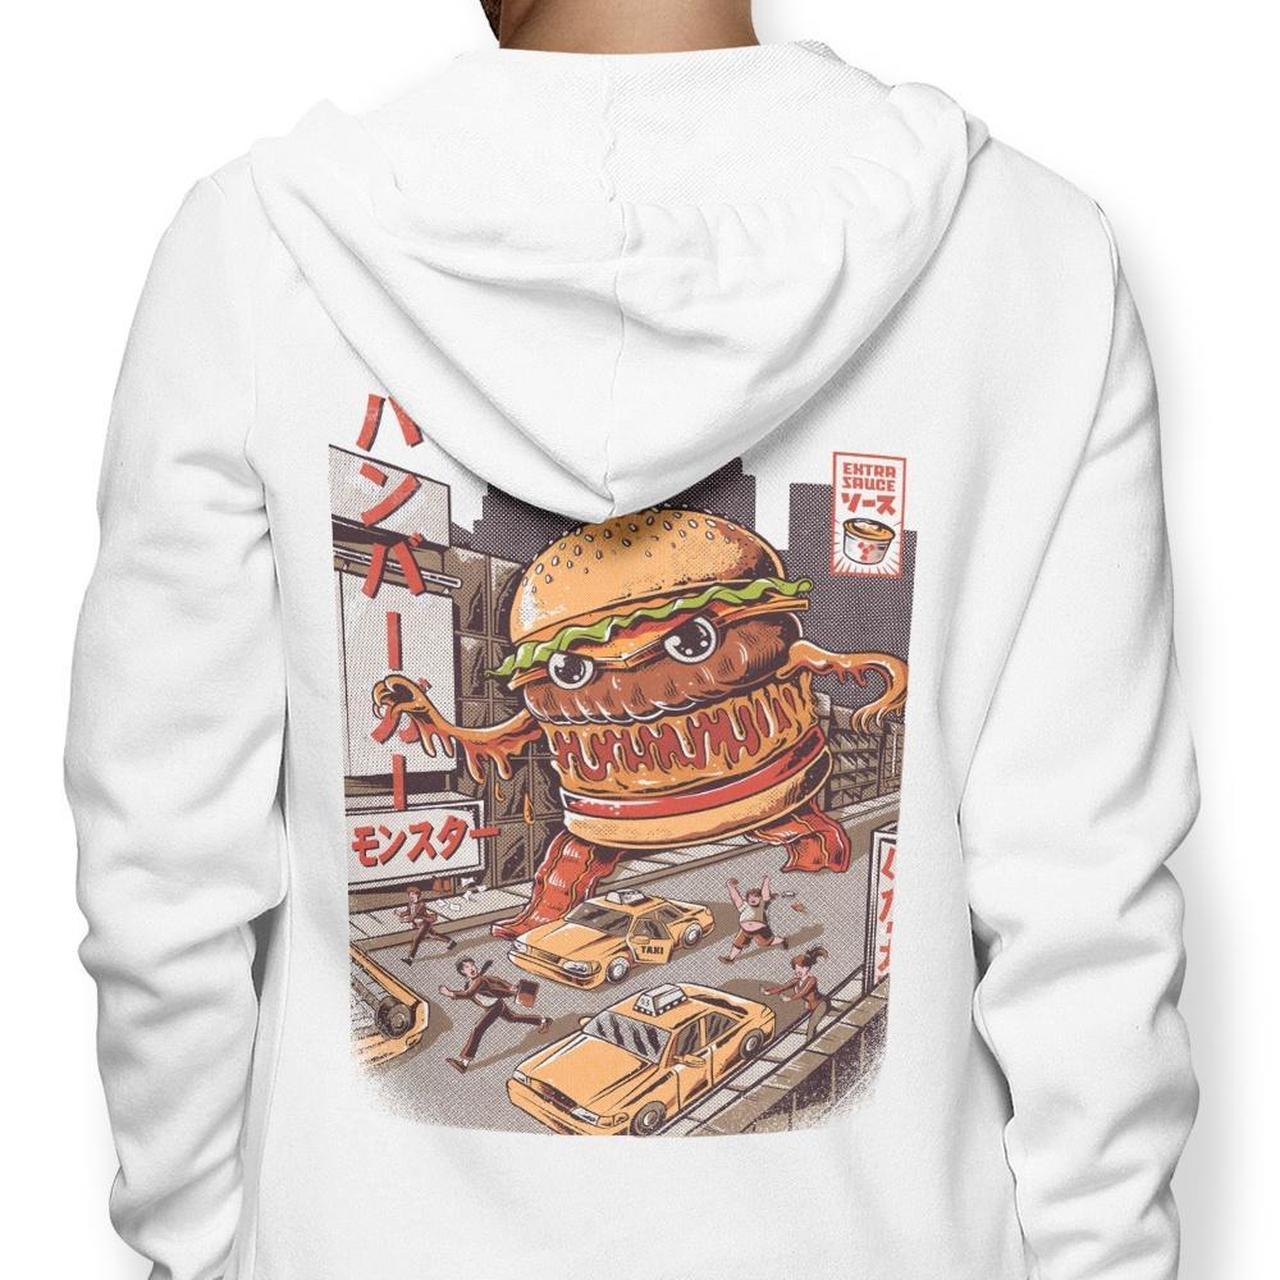 Burgerzilla 373692871 Shirts